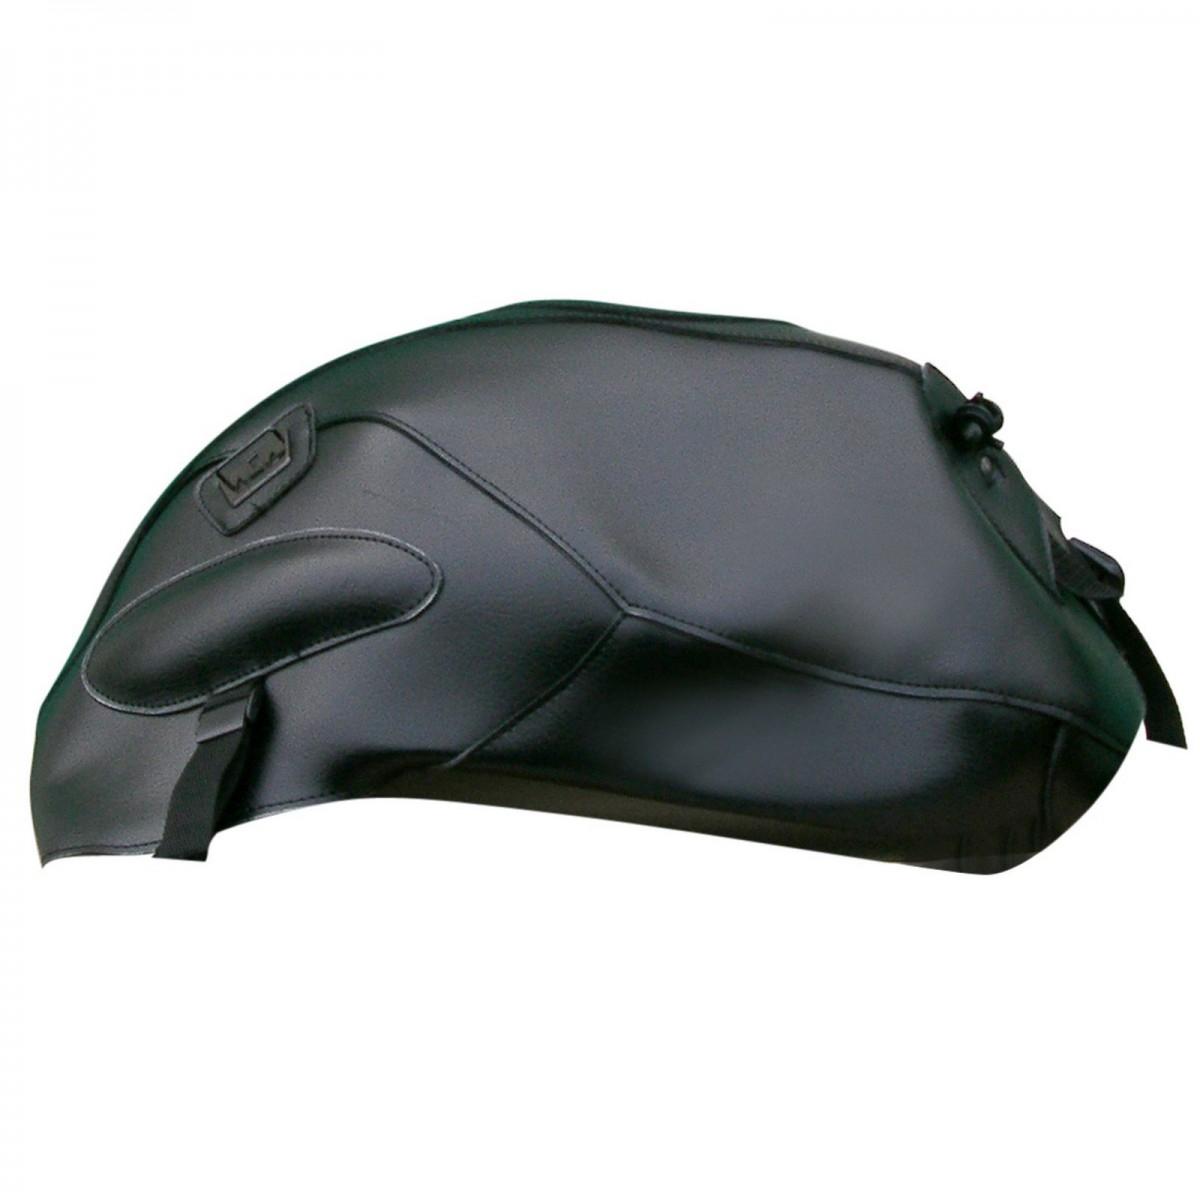 Protège-réservoir Bagster Honda CBF 600 N 08-11 noir